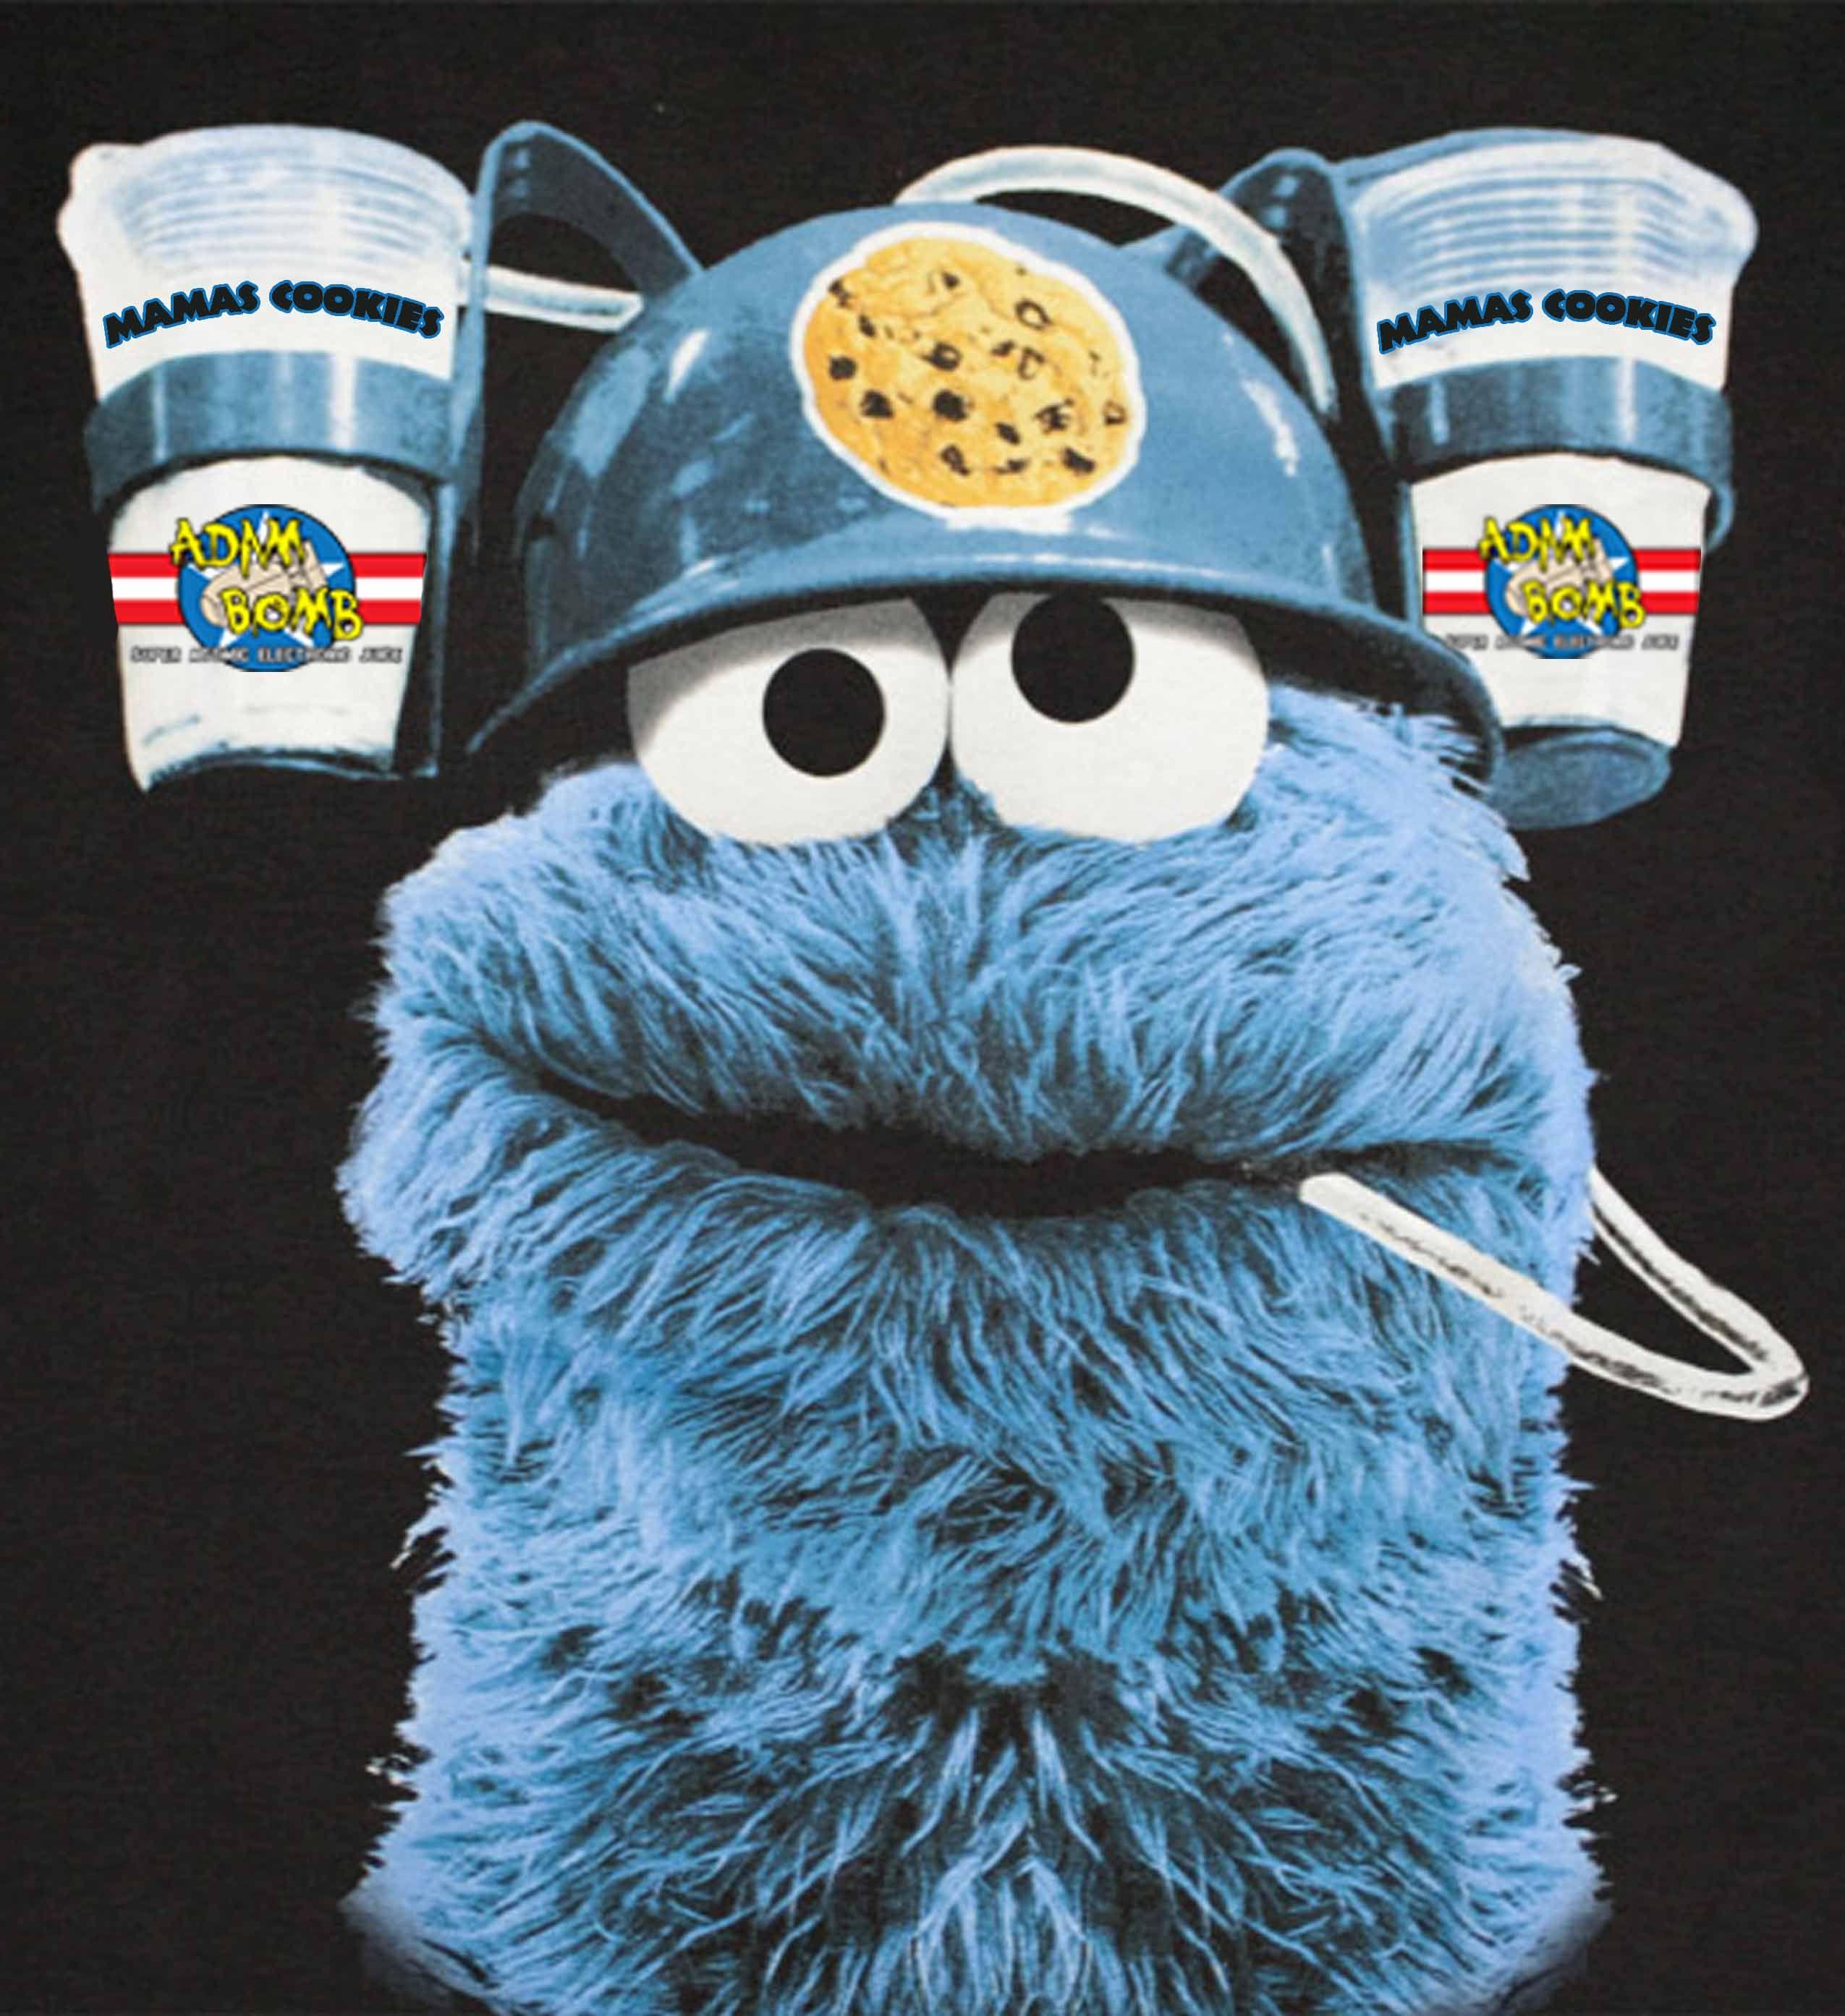 Cookie Monster x Adam Bomb (Mamas Cookies) | Vape Guys Designz ...